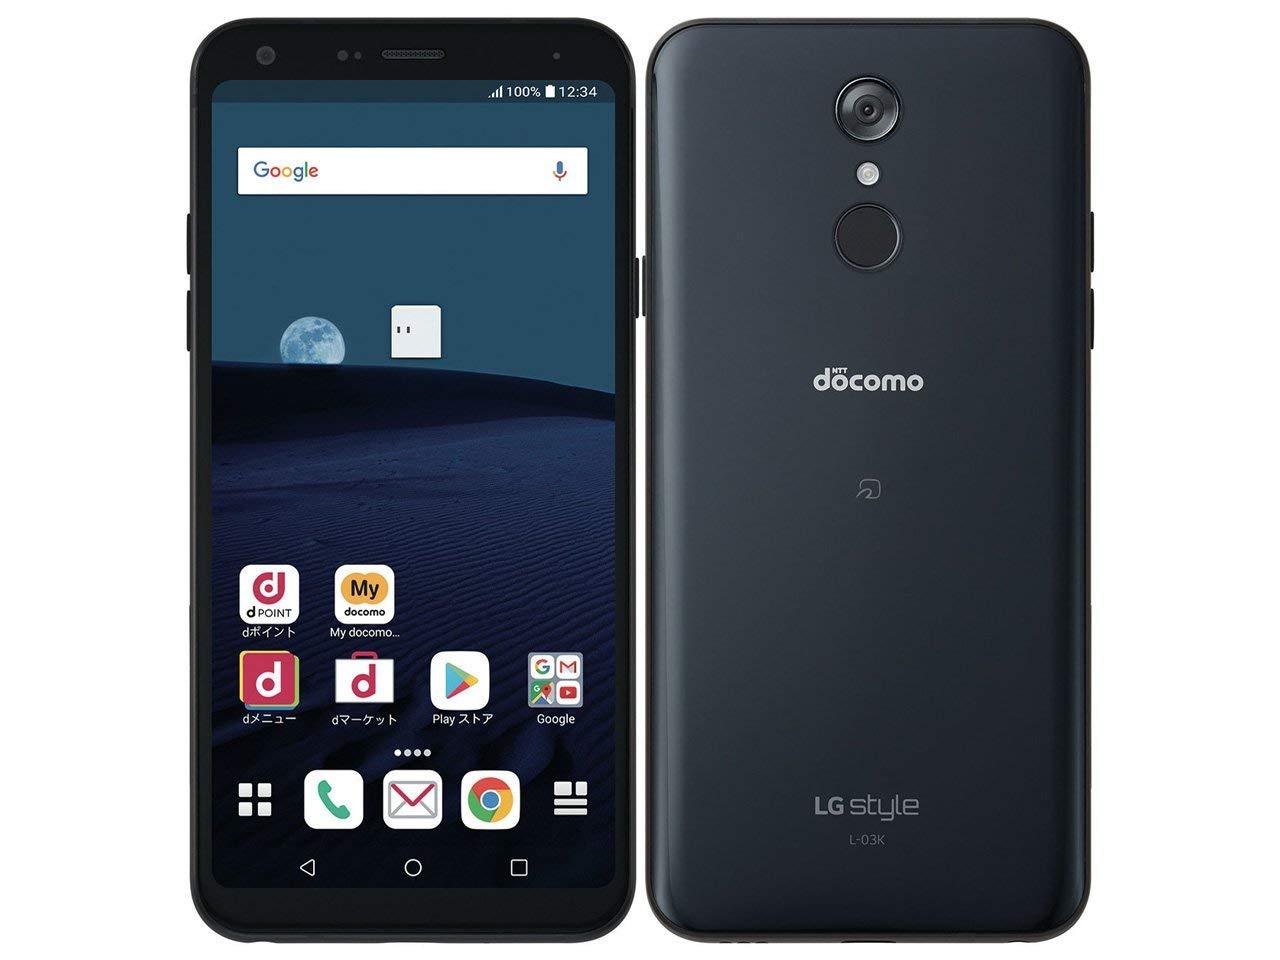 docomo L-03K 本体 SIMフリー 新品未使用 正規SIMロック解除済み LG style ブラック Black 一括購入品 ネットワーク利用制限〇